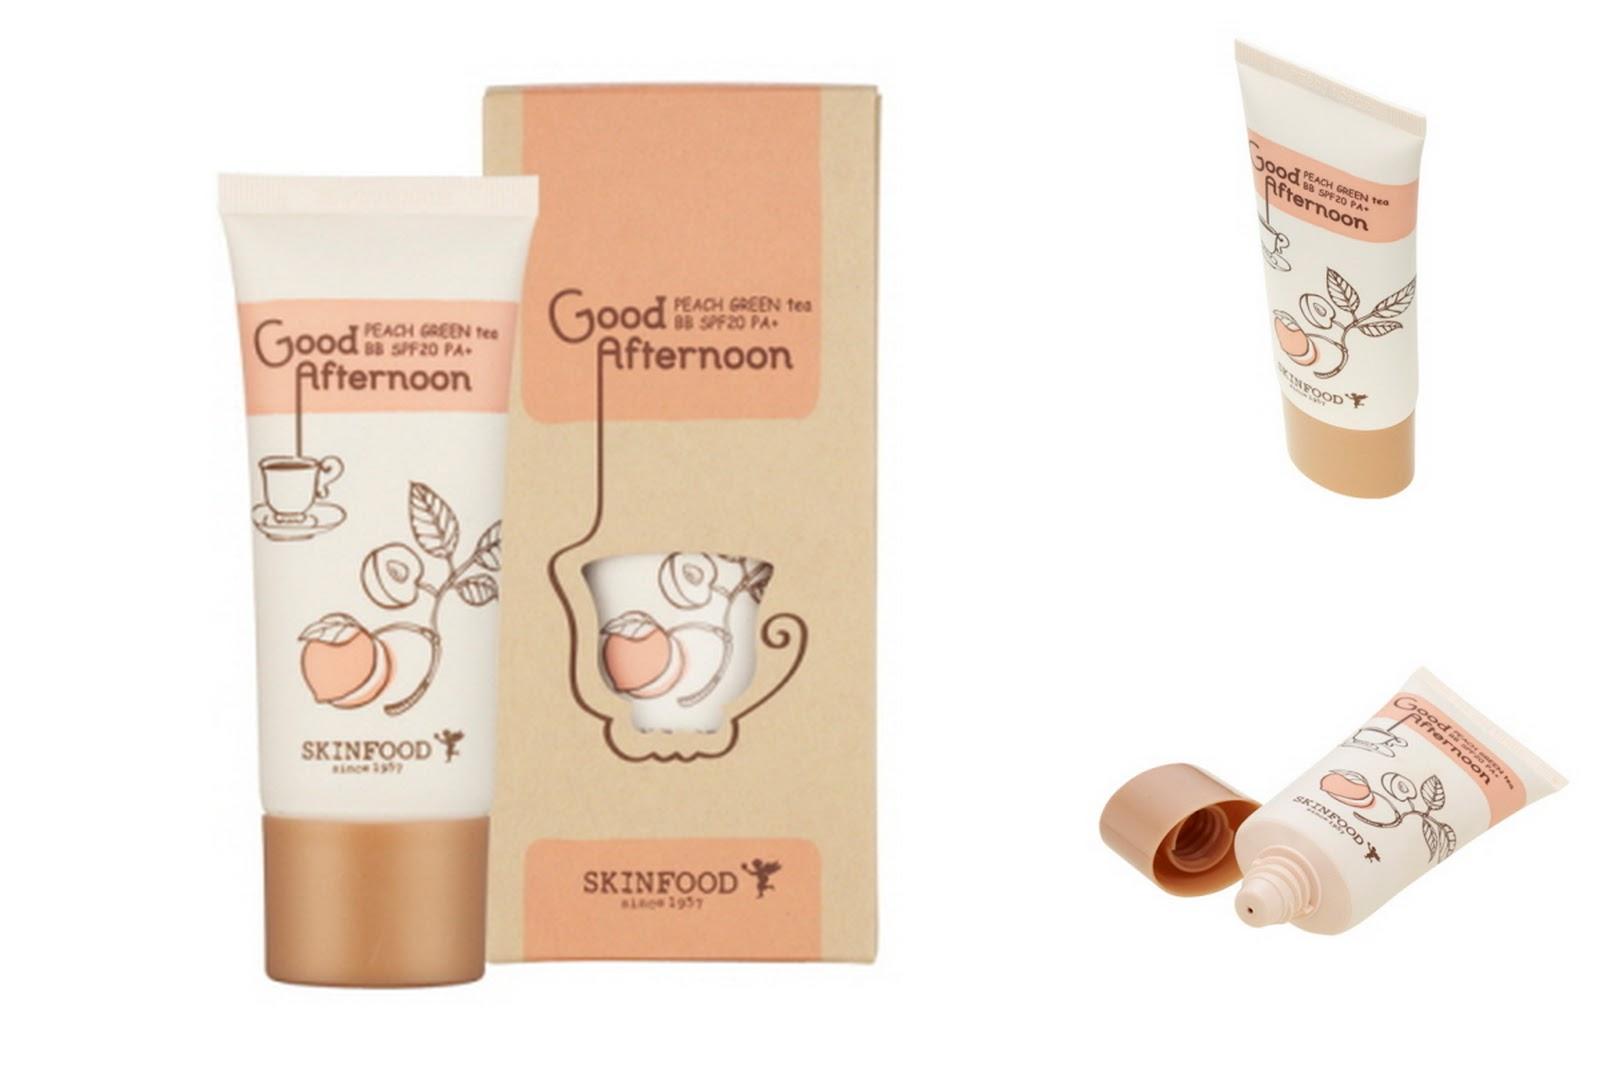 Биби-крем для жирной кожи skinfood peach green tea bb cream / хару-хару!.